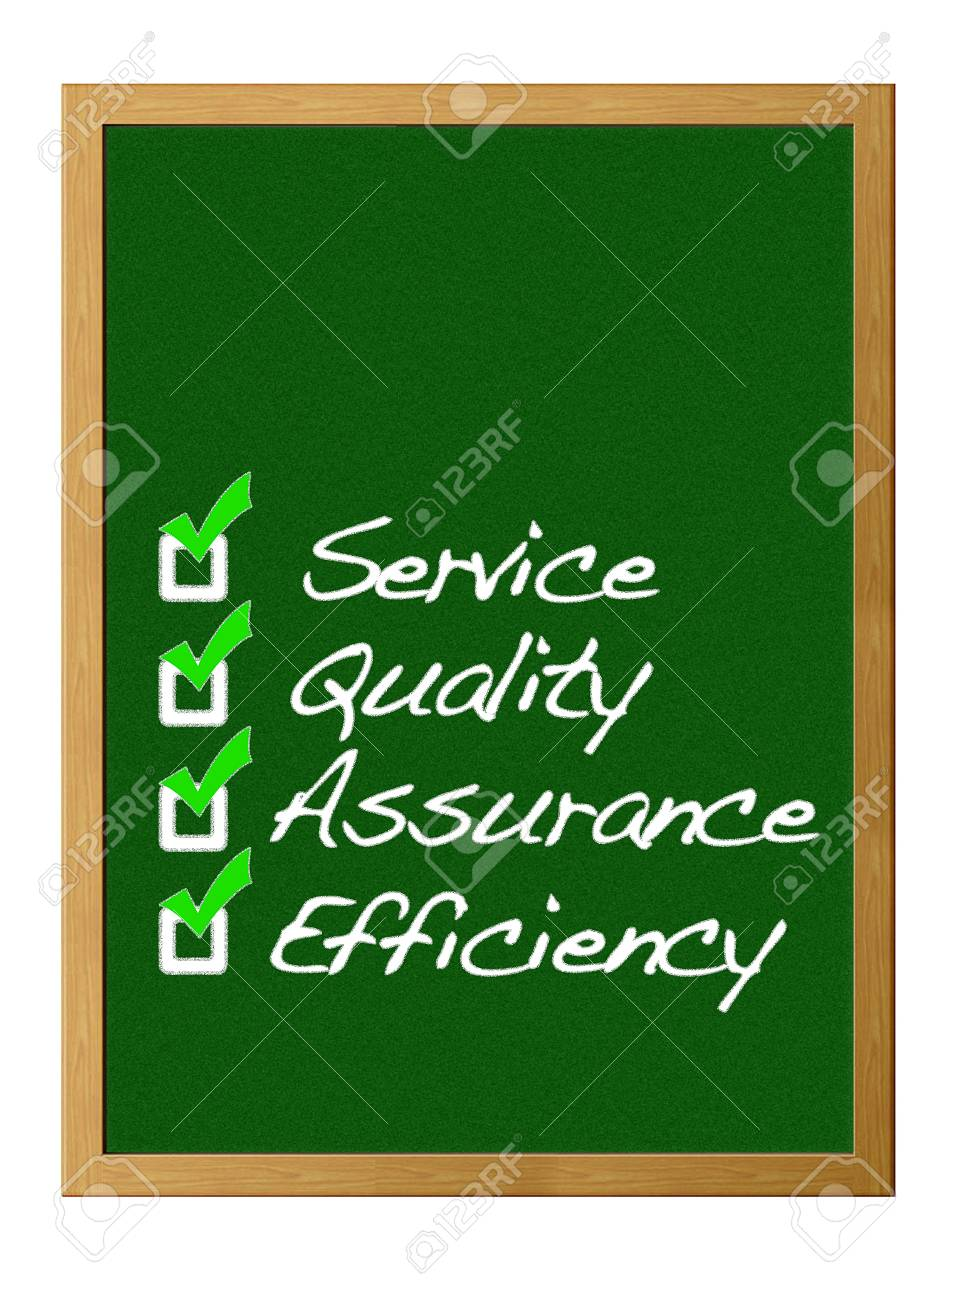 Service, Quality, assurance, Efficiency. Stock Photo - 12215032